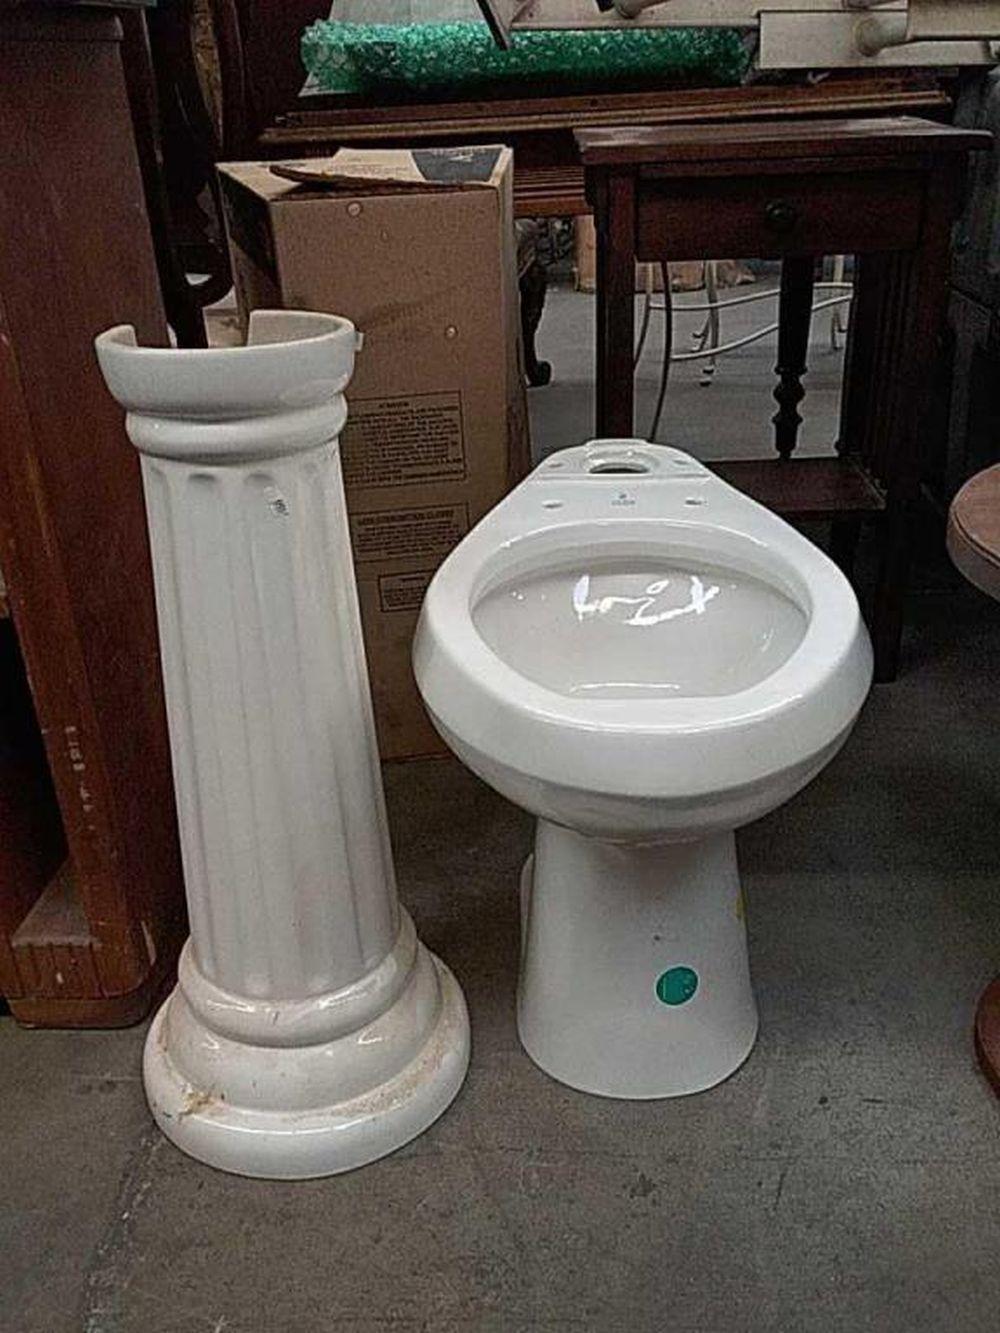 Peachy Porcelain Pedestal Sink Base And Crane Toilet Bowl Beatyapartments Chair Design Images Beatyapartmentscom